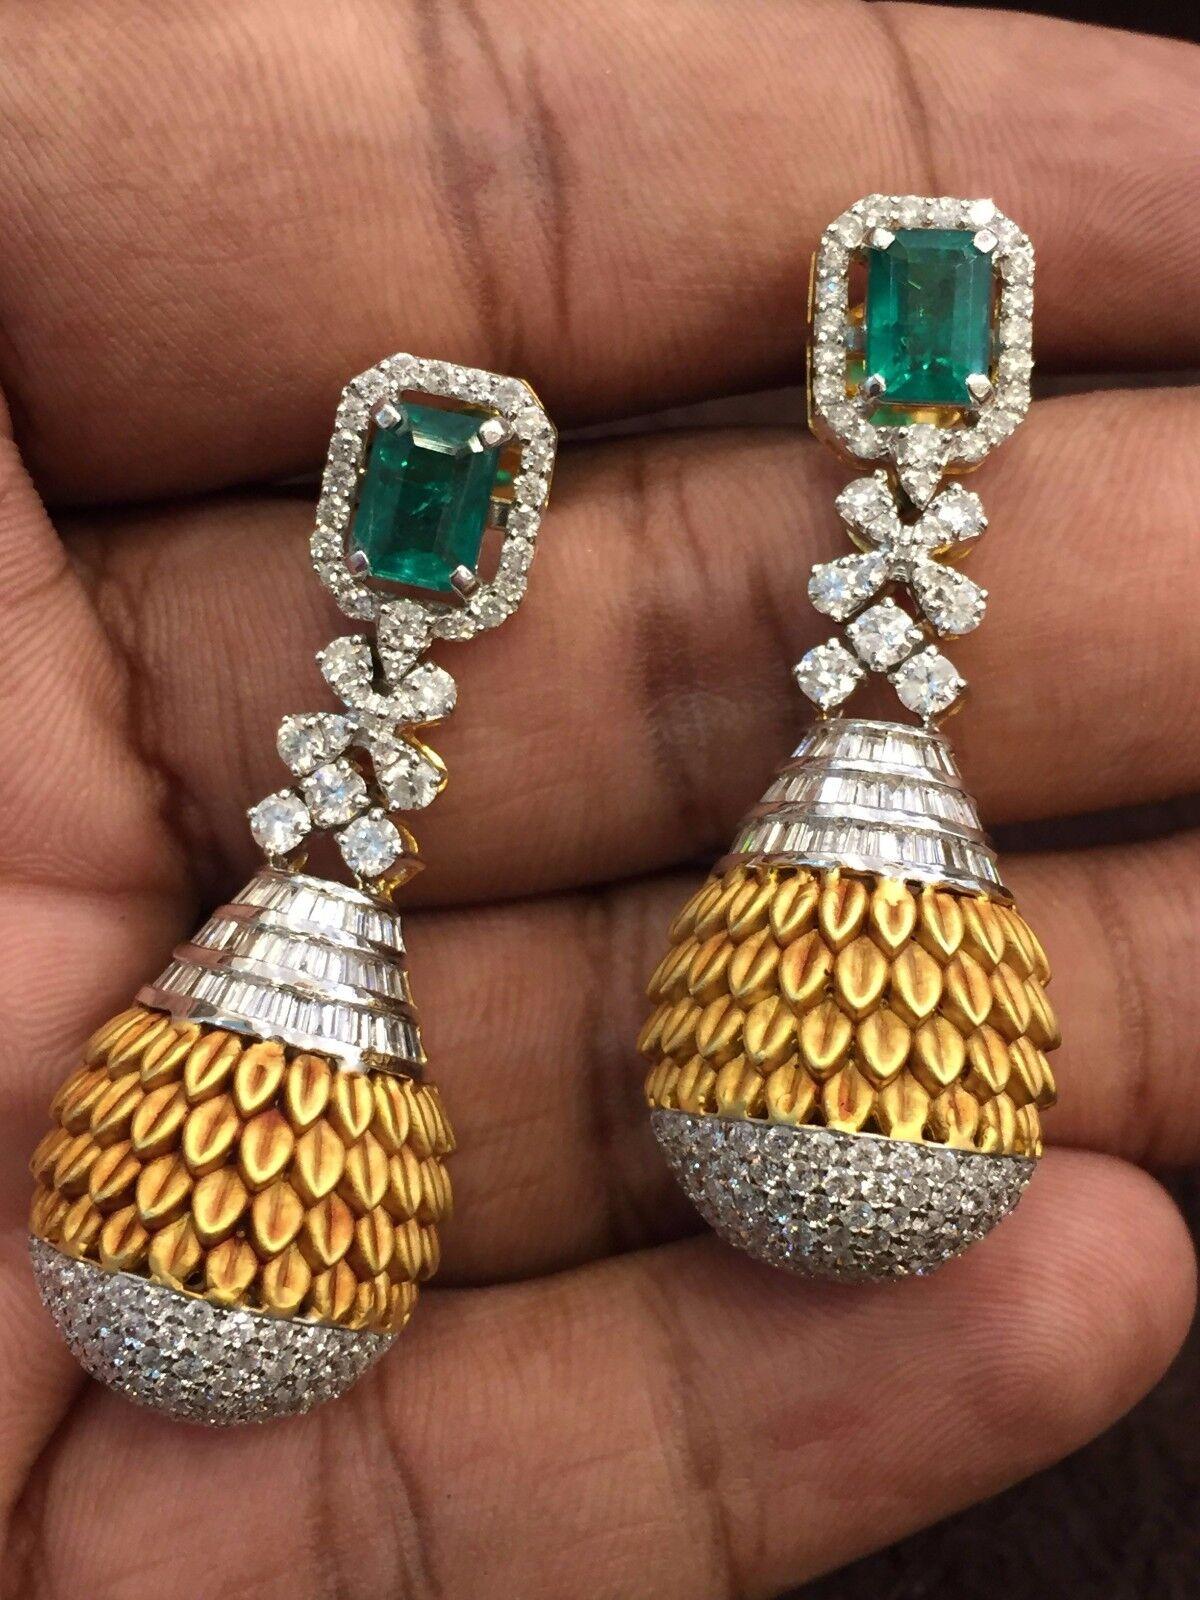 Pave 6.30 Carats Round Baguette Cut Diamonds Emerald Dangle Earrings In 14K gold